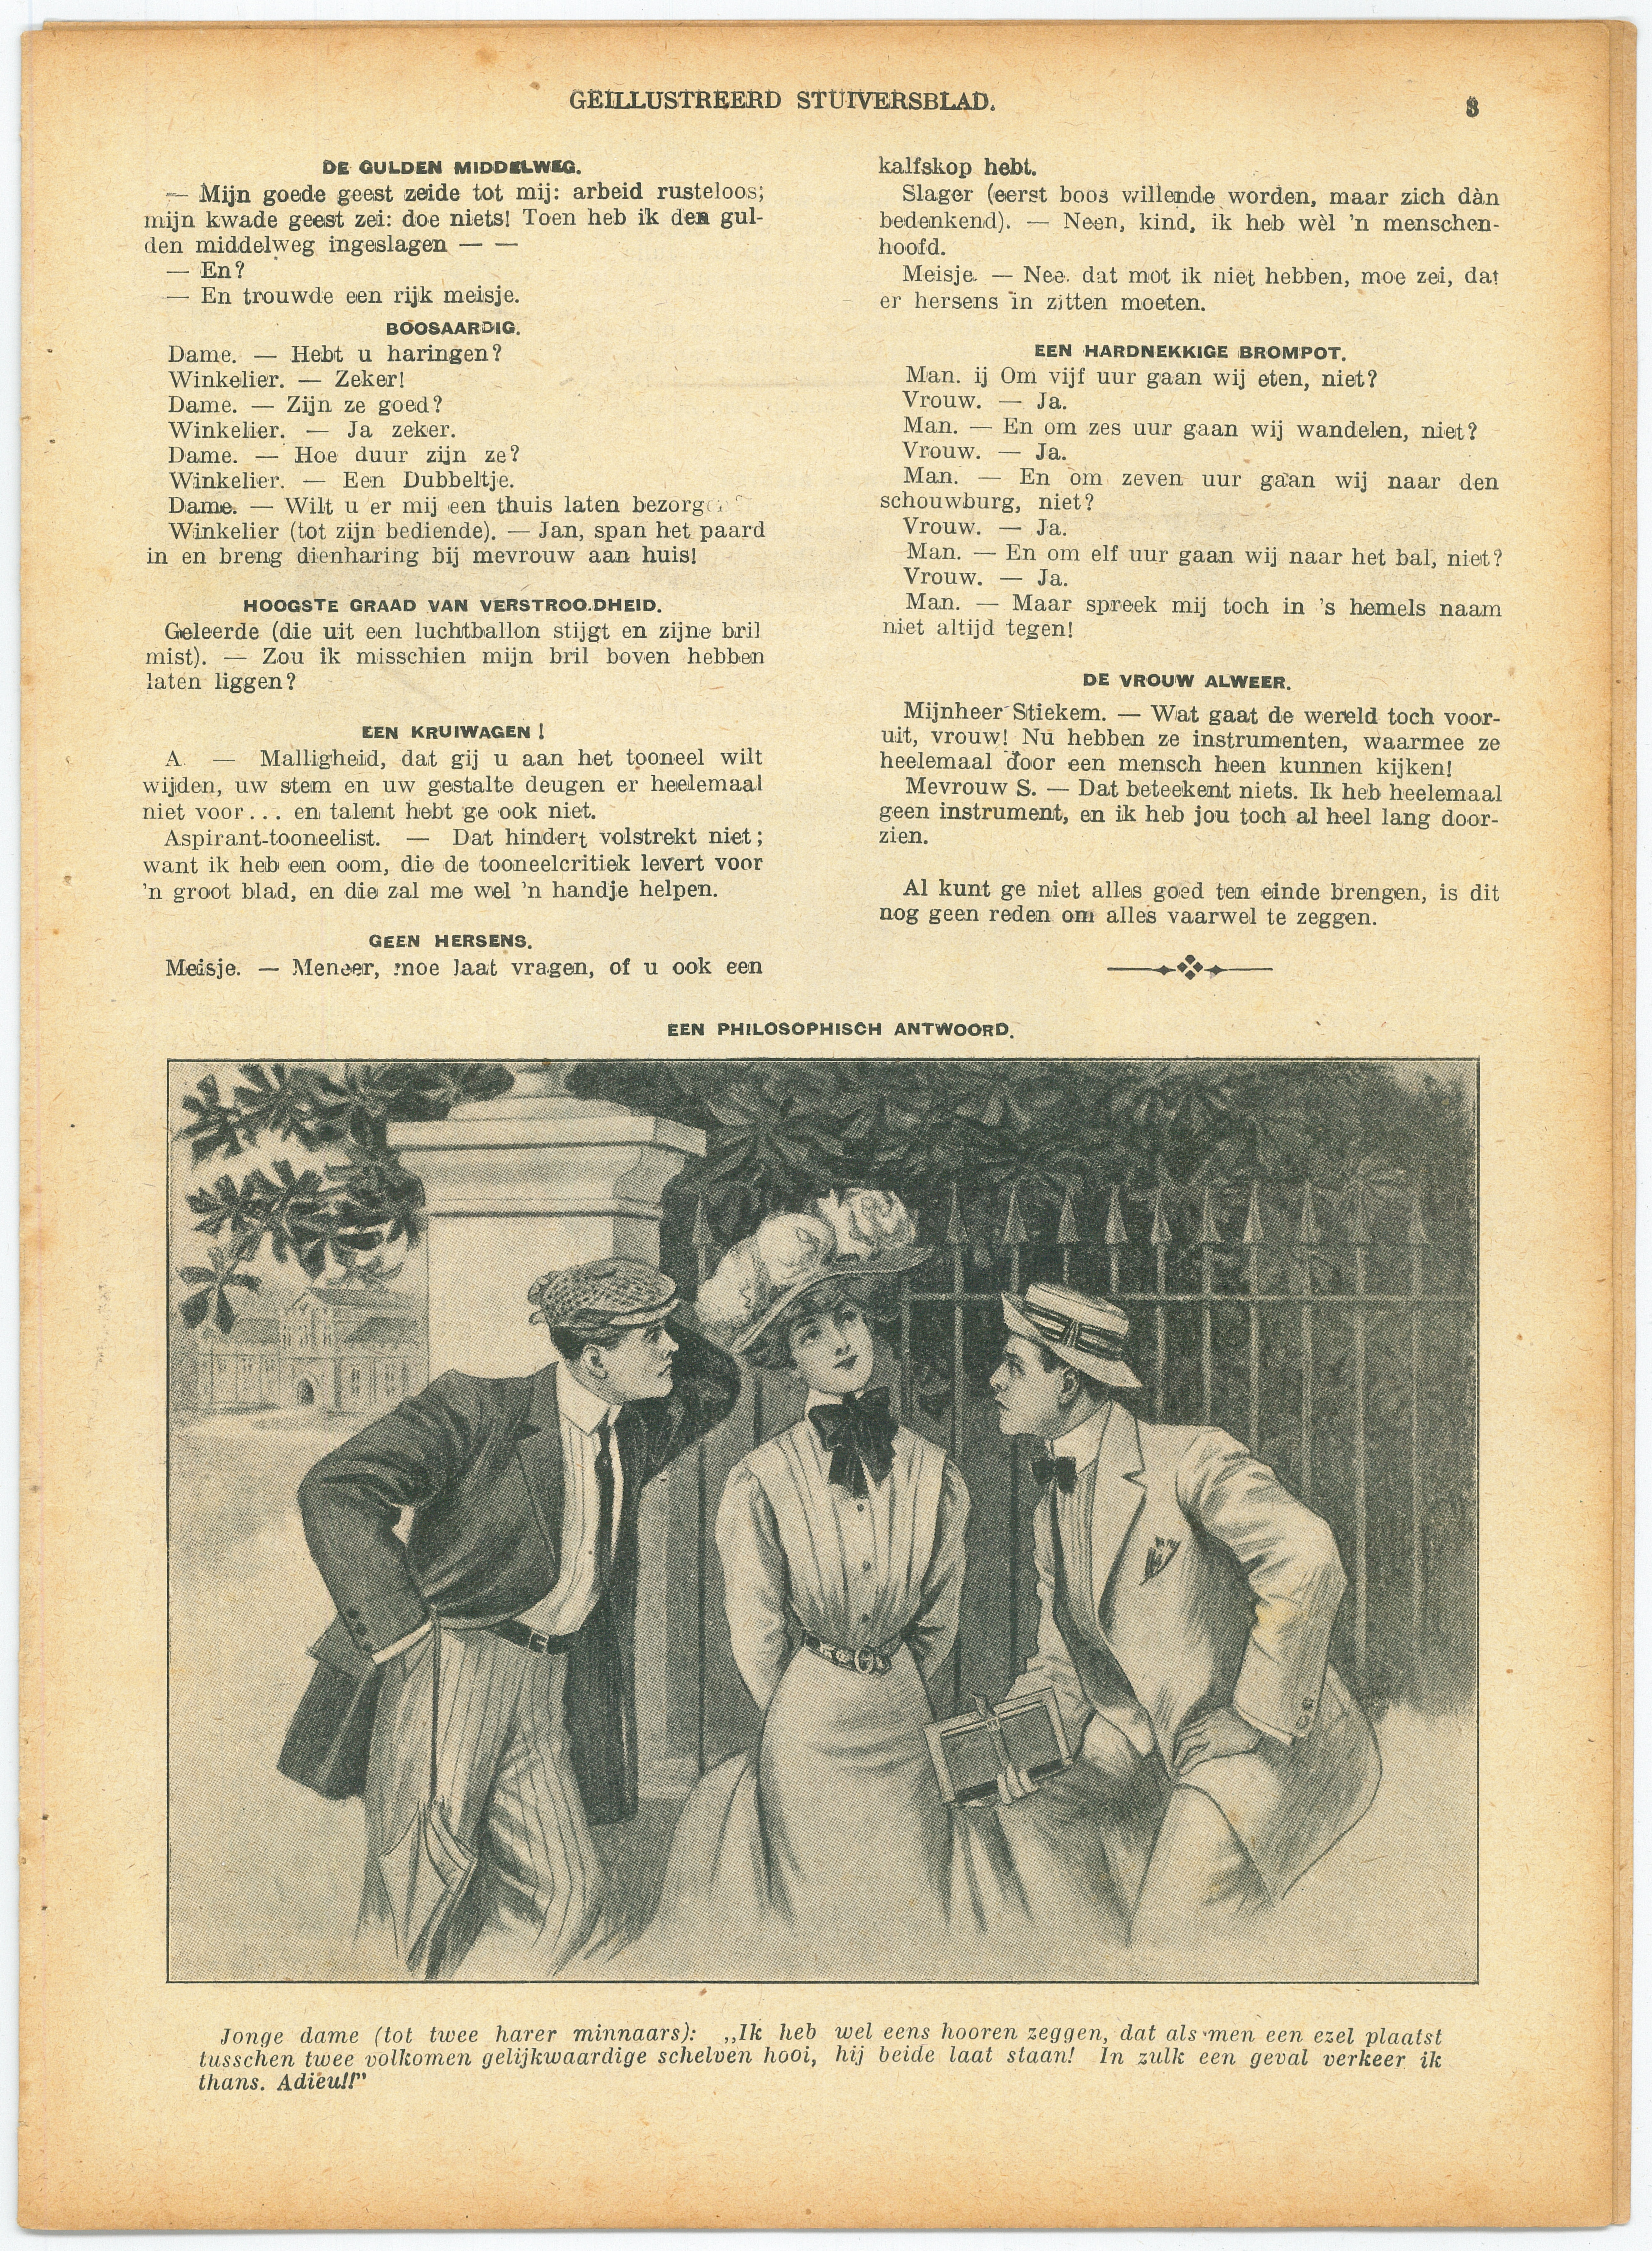 File:Stuivers Blad No21, 23 Mei 1915 pagina 3.jpg